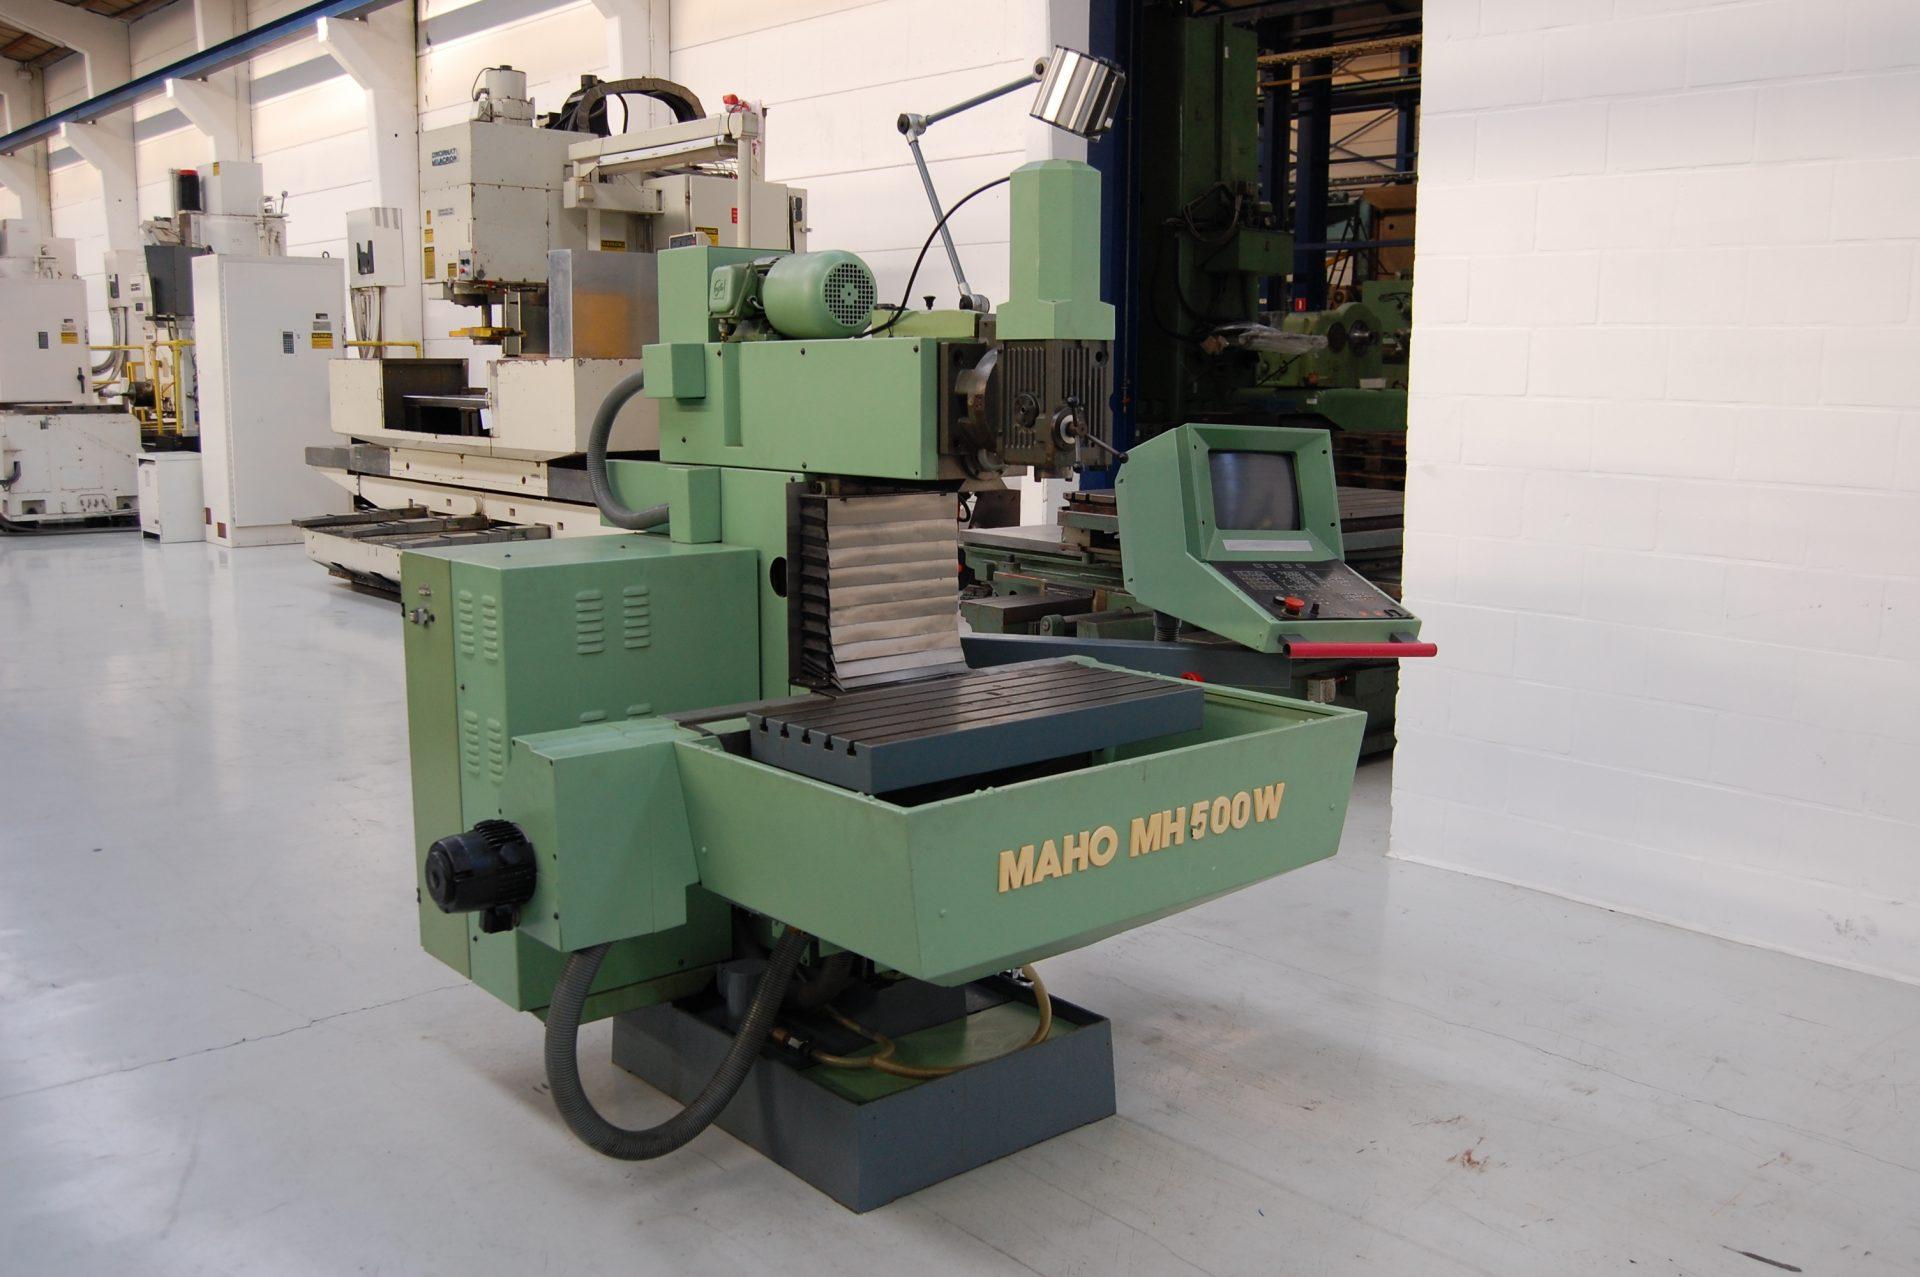 MAHO MH500W (12.017J1)